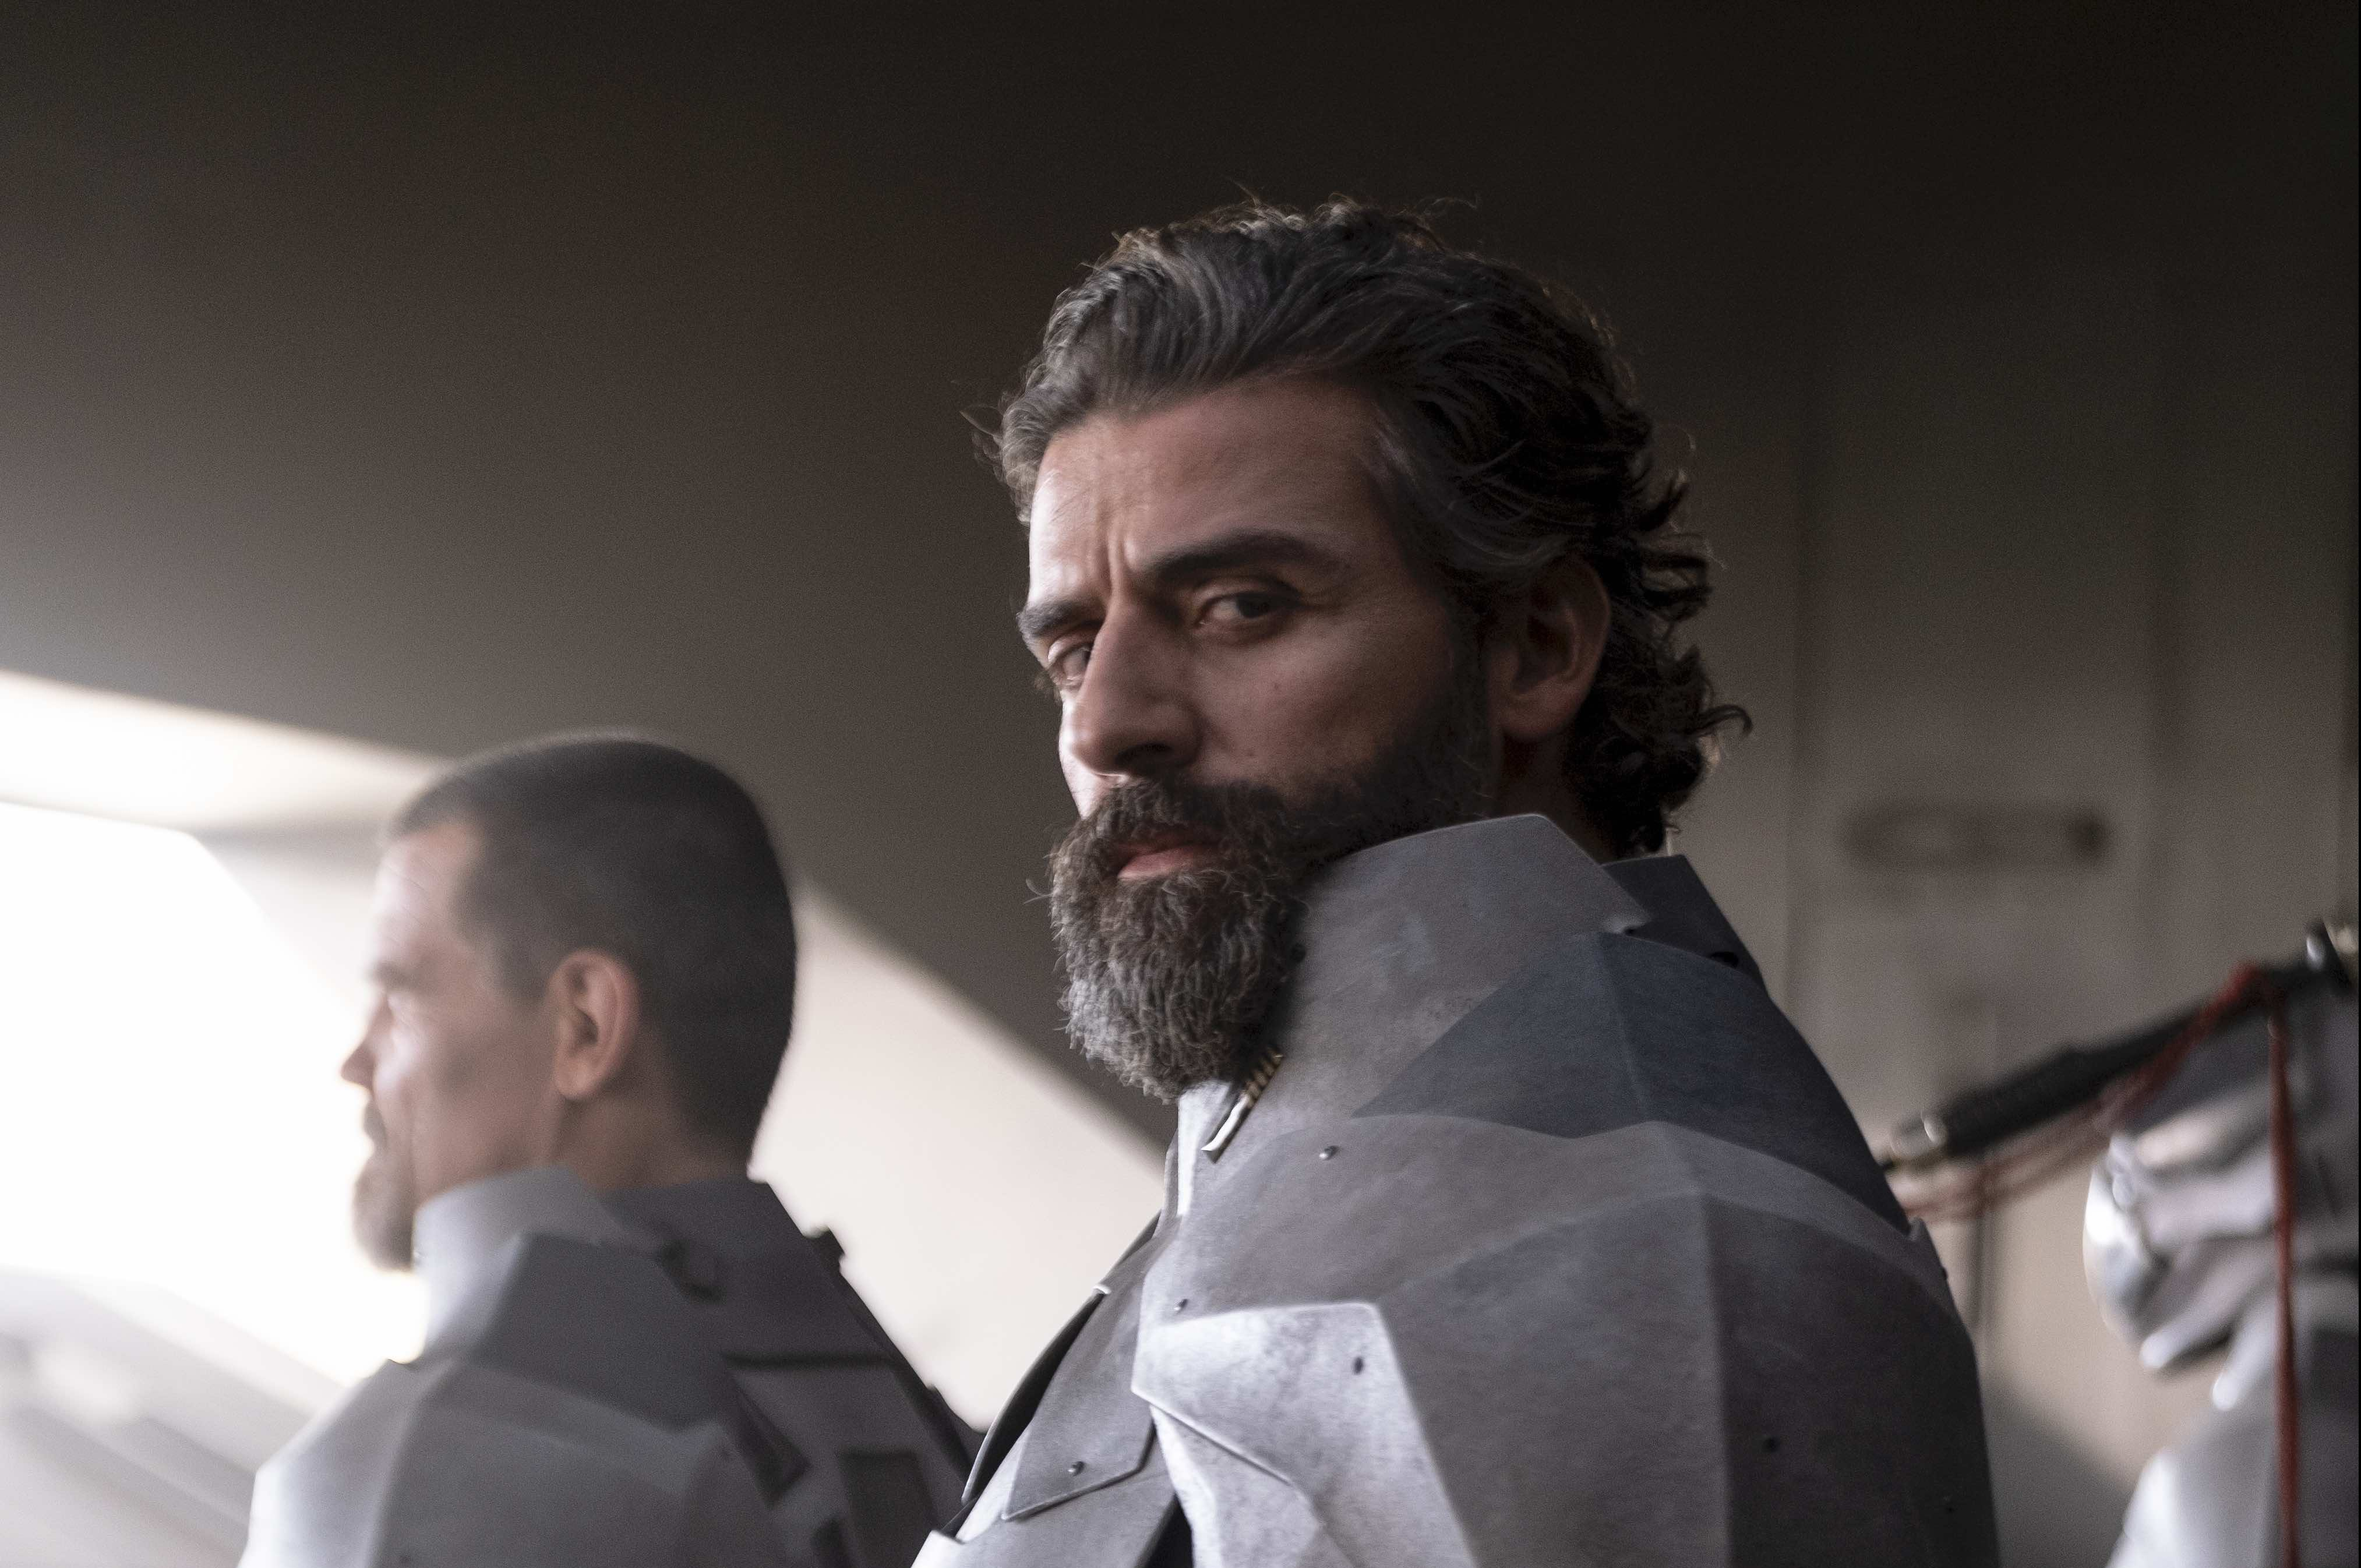 Oscar Isaac's Beard Pulls Focus in New Still Images From Denis Villeneuve's 'Dune' Adaptation